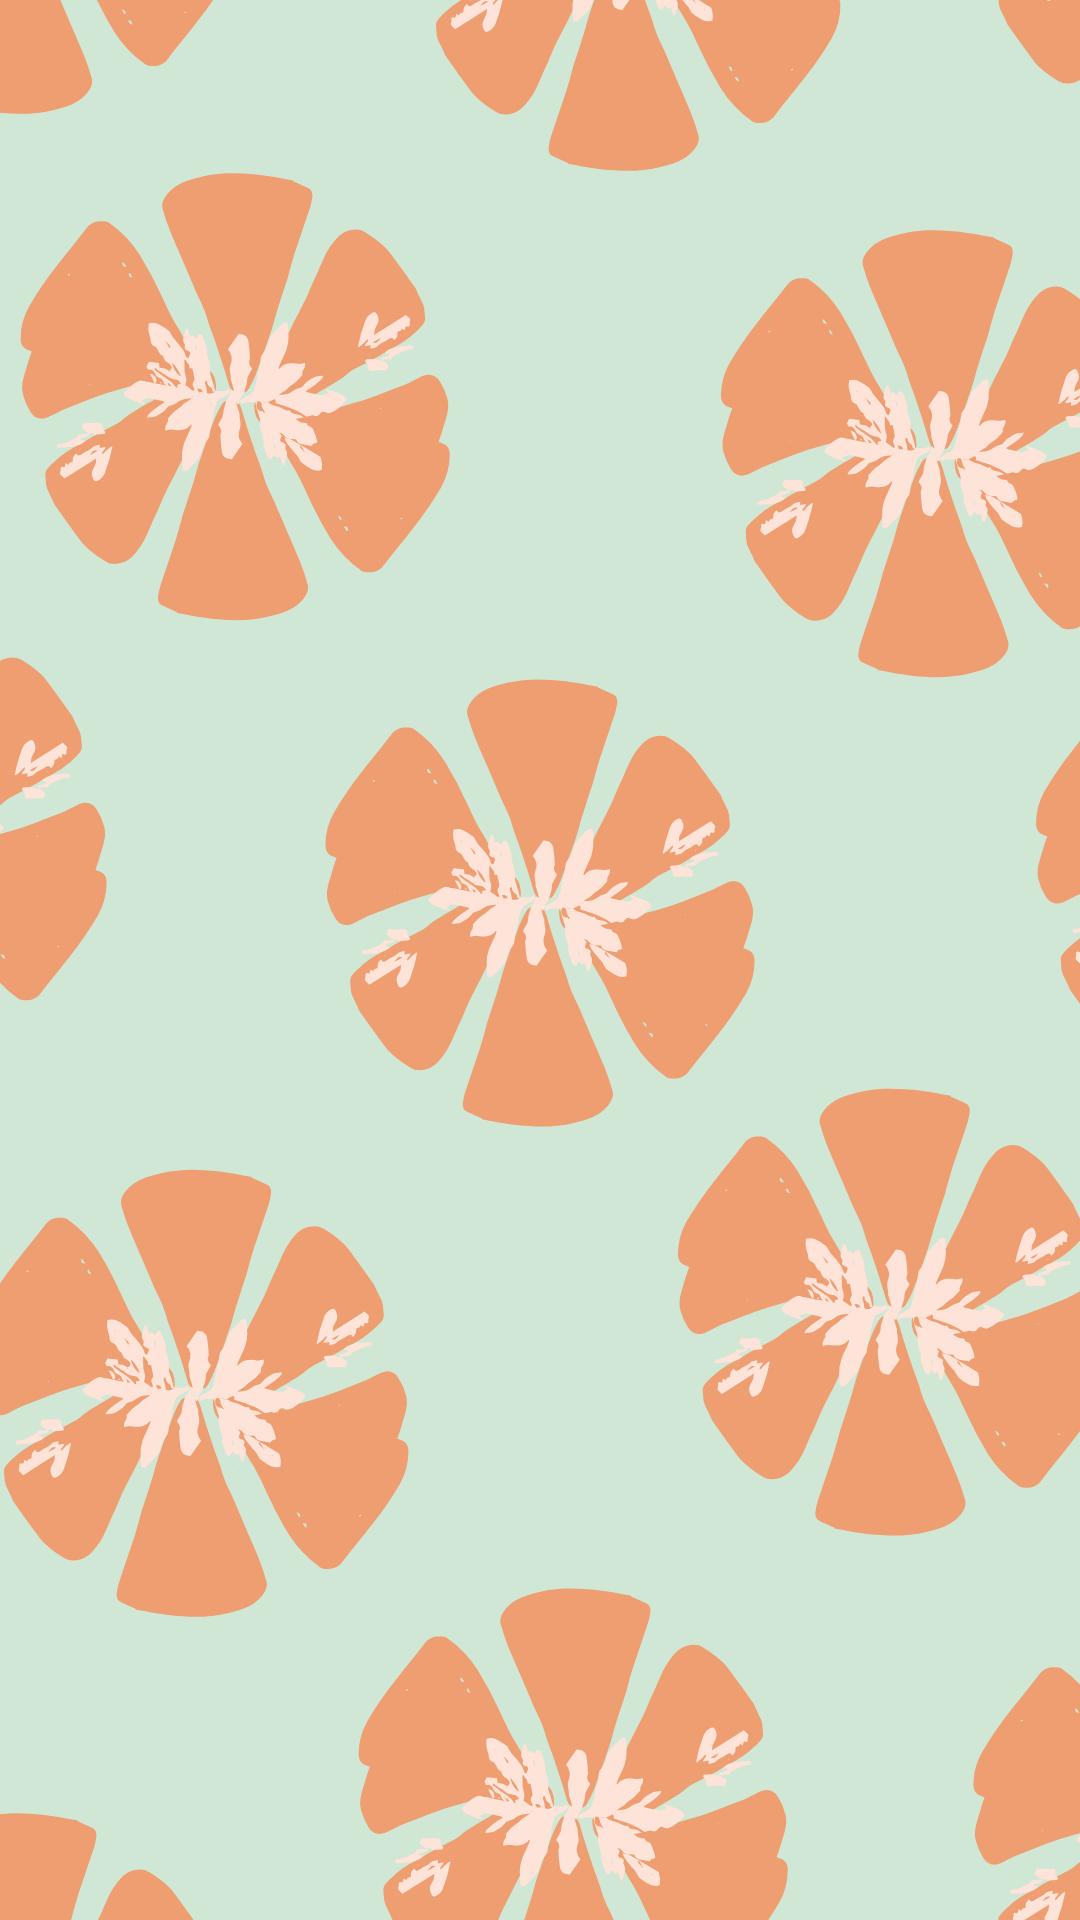 Floral Pastel Pattern Free Mobile Wallpaper Background Lock Screen Saver Aesthetic Iphone Wallpaper Pattern Cute Patterns Wallpaper Aesthetic Iphone Wallpaper